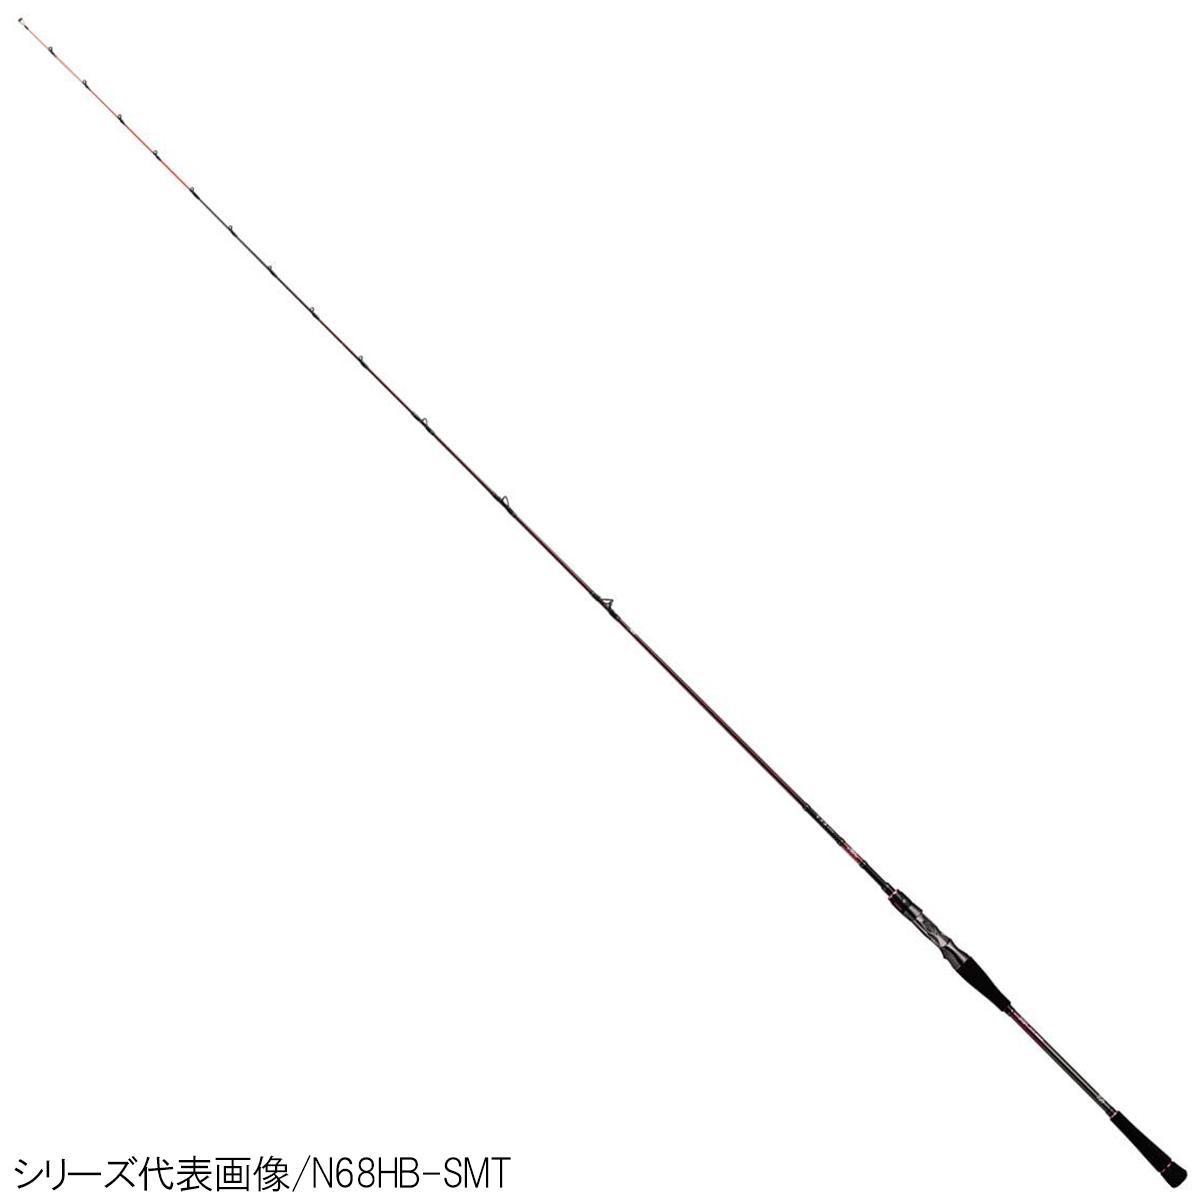 紅牙 EX K64HB-SMT ダイワ【大型商品】【同梱不可】